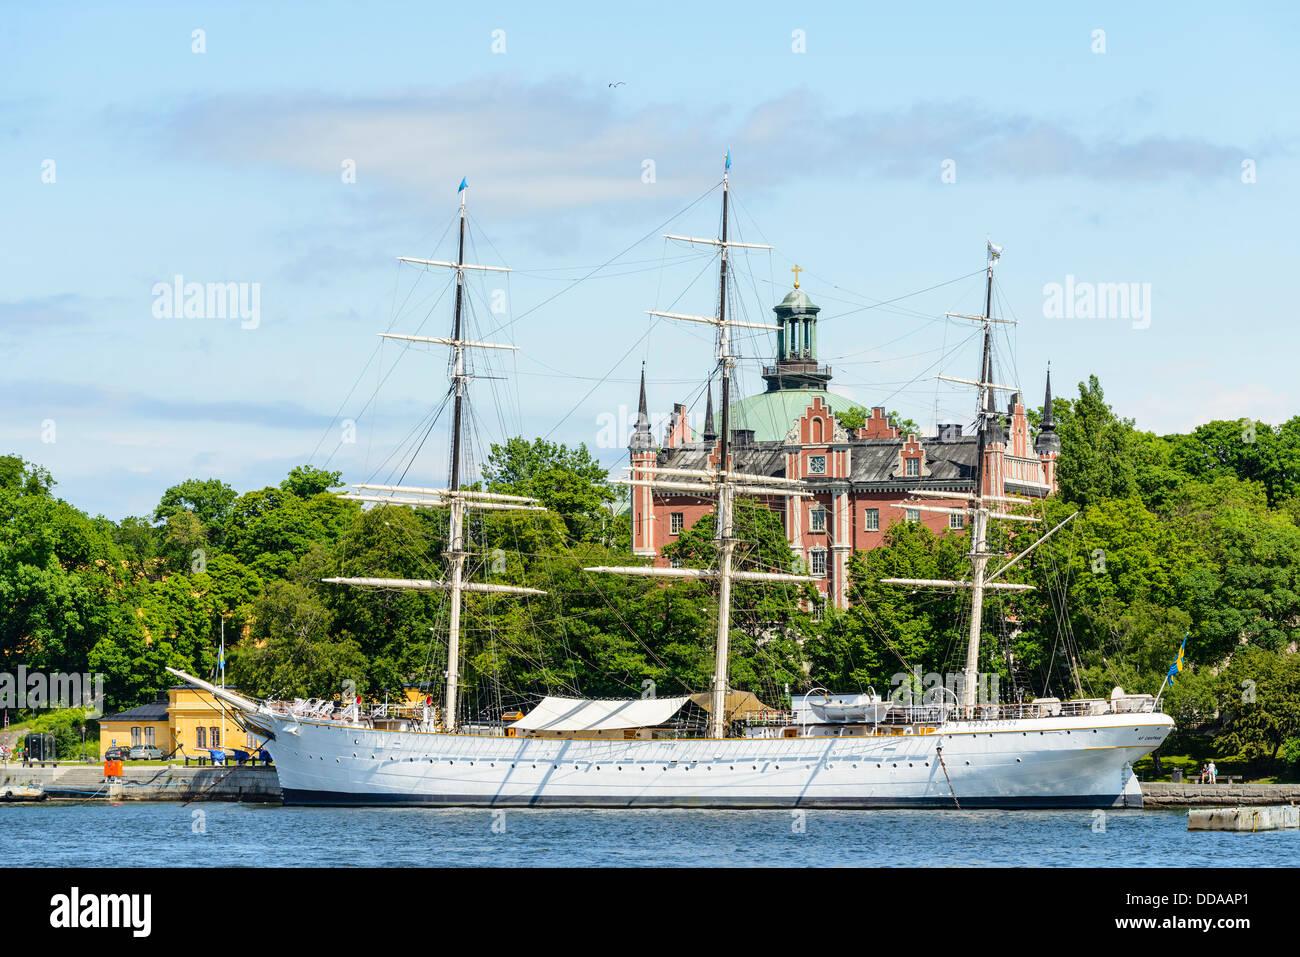 Sightseeing boat at Nybrokajen Stockholm Sweden - Stock Image